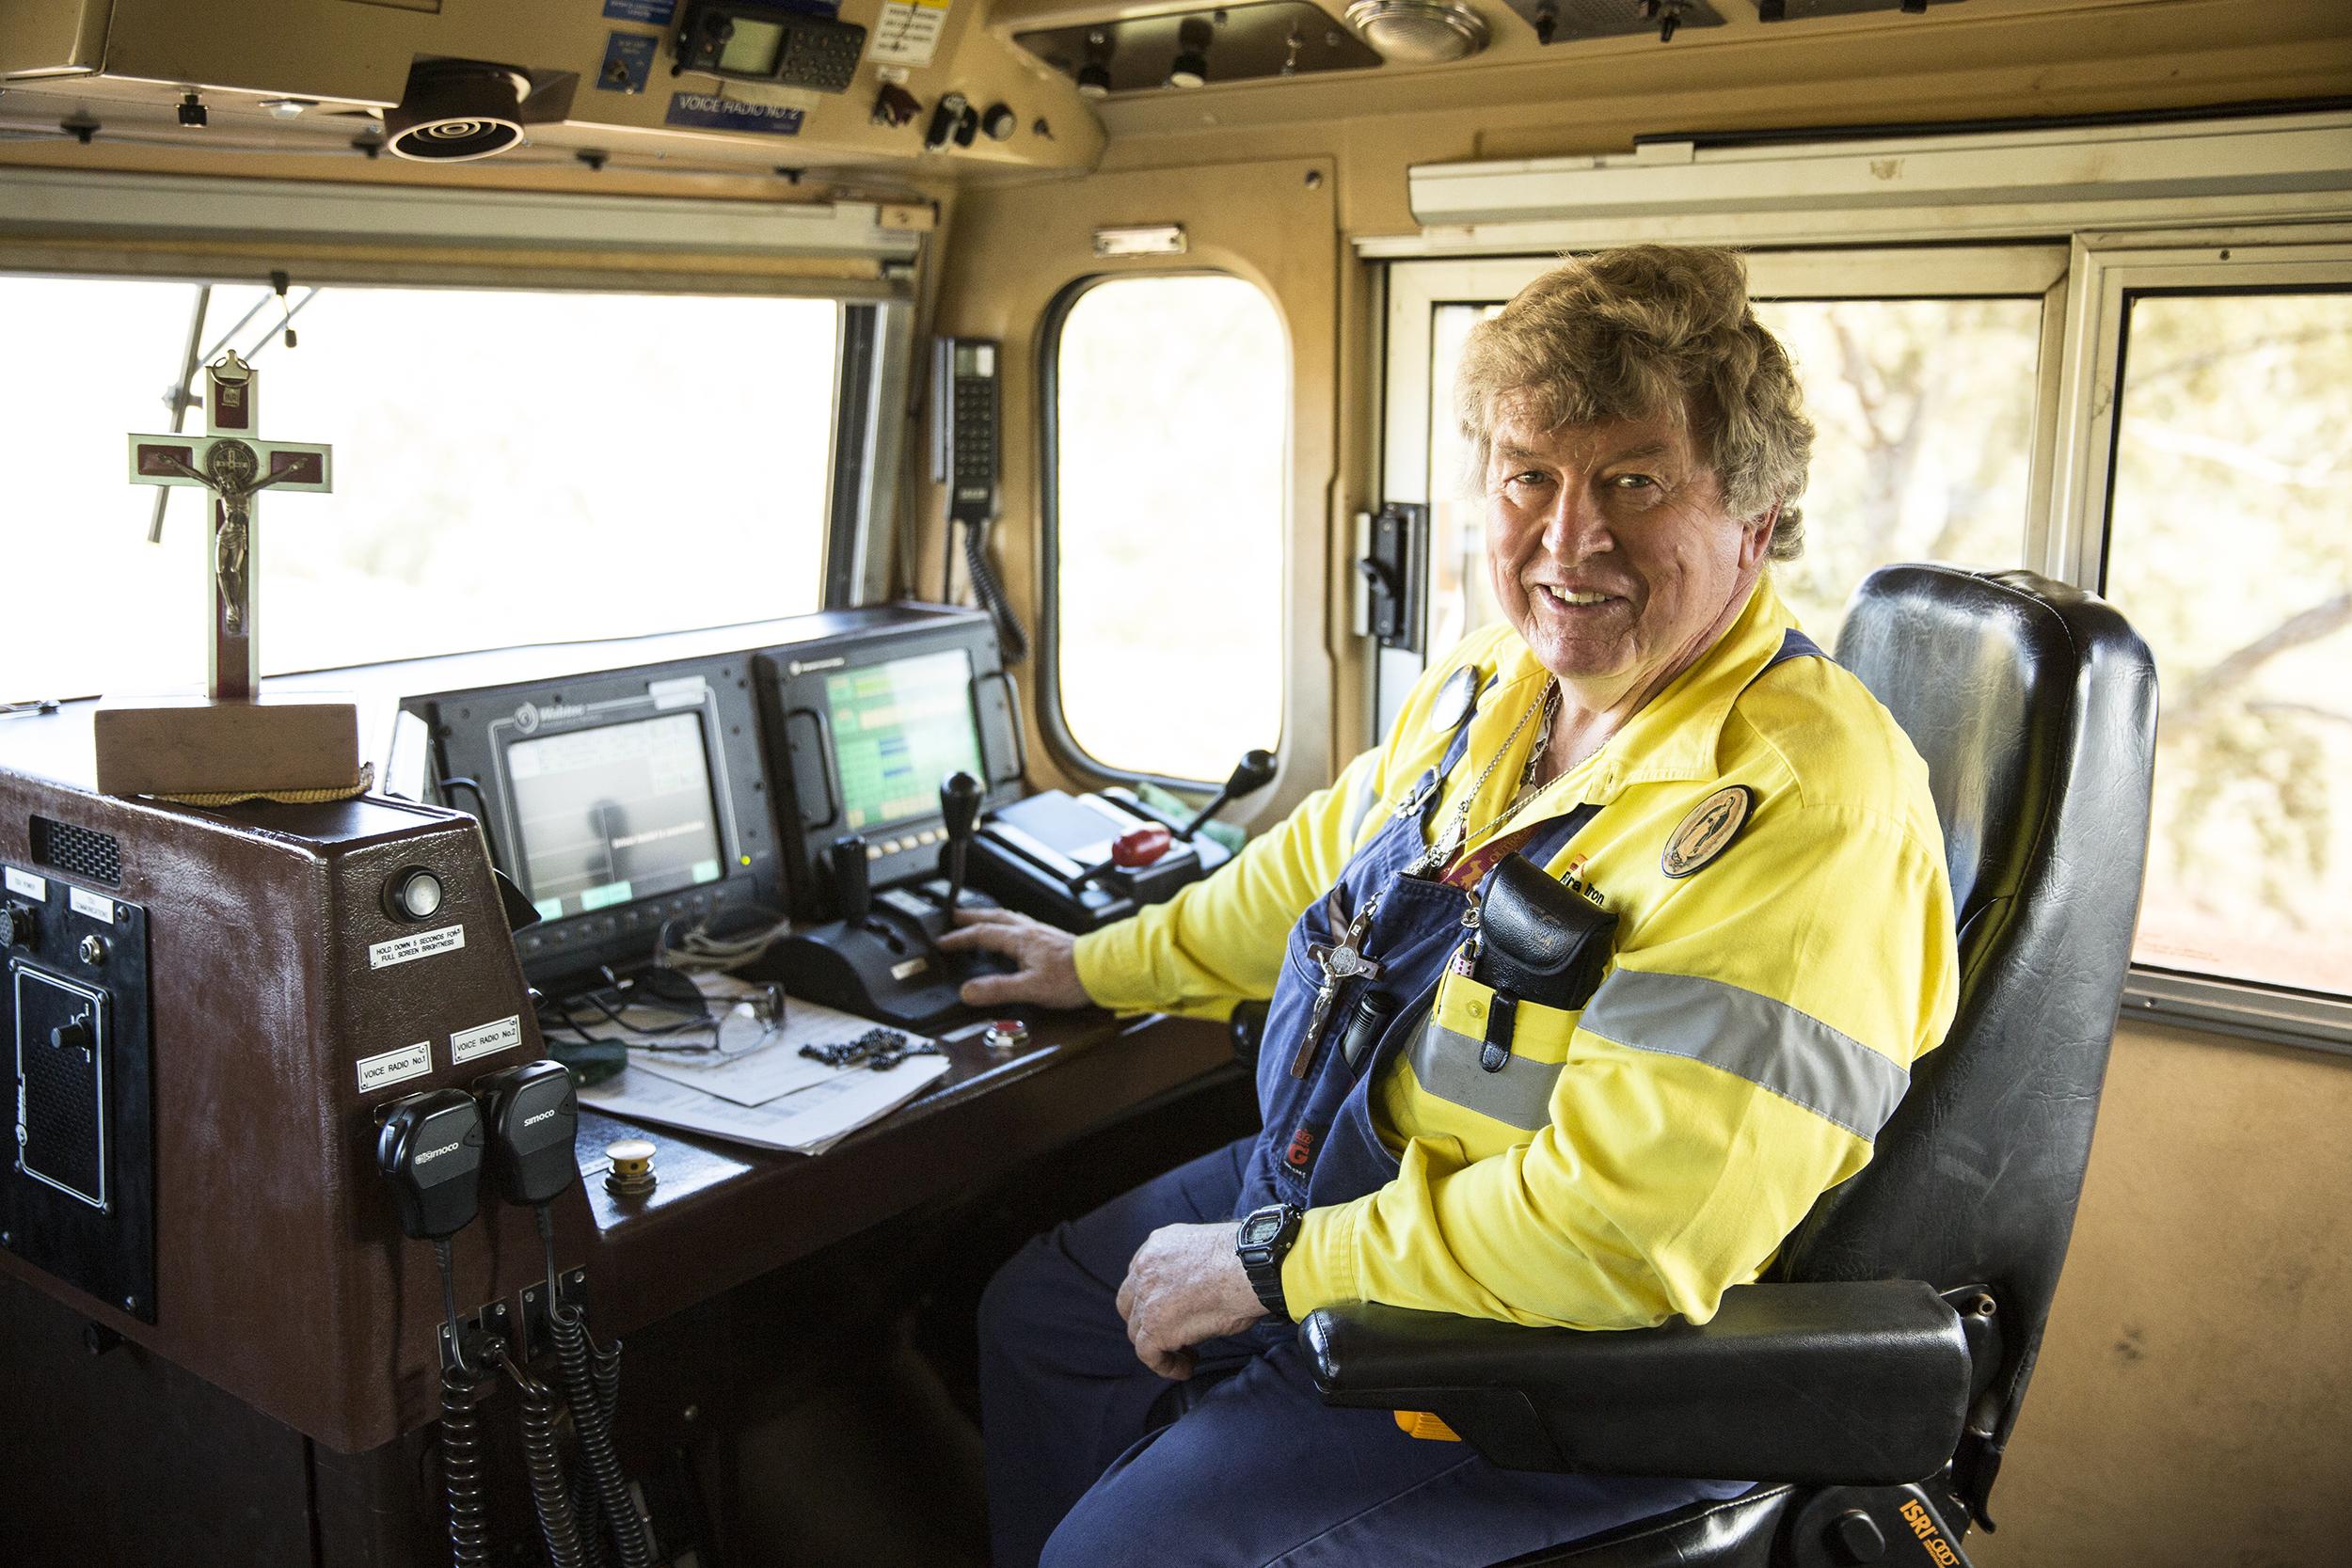 Kerry Stubbs, Train Driver, Rio Tinto, 2013. Edition of 3.